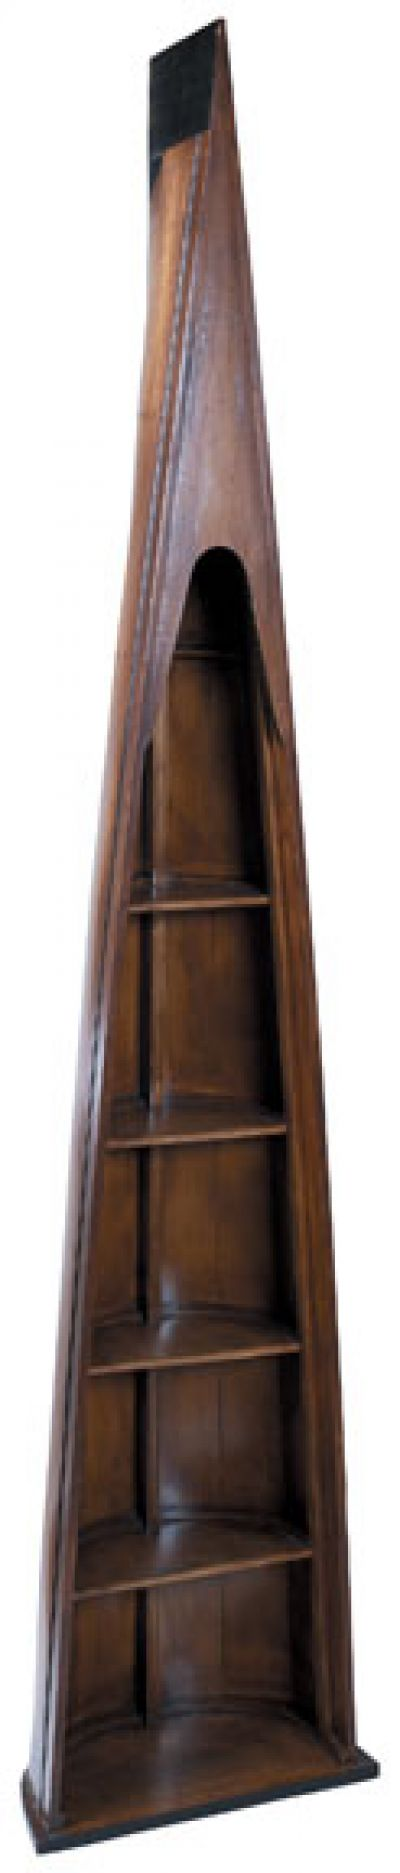 Canoe Bookcase 86